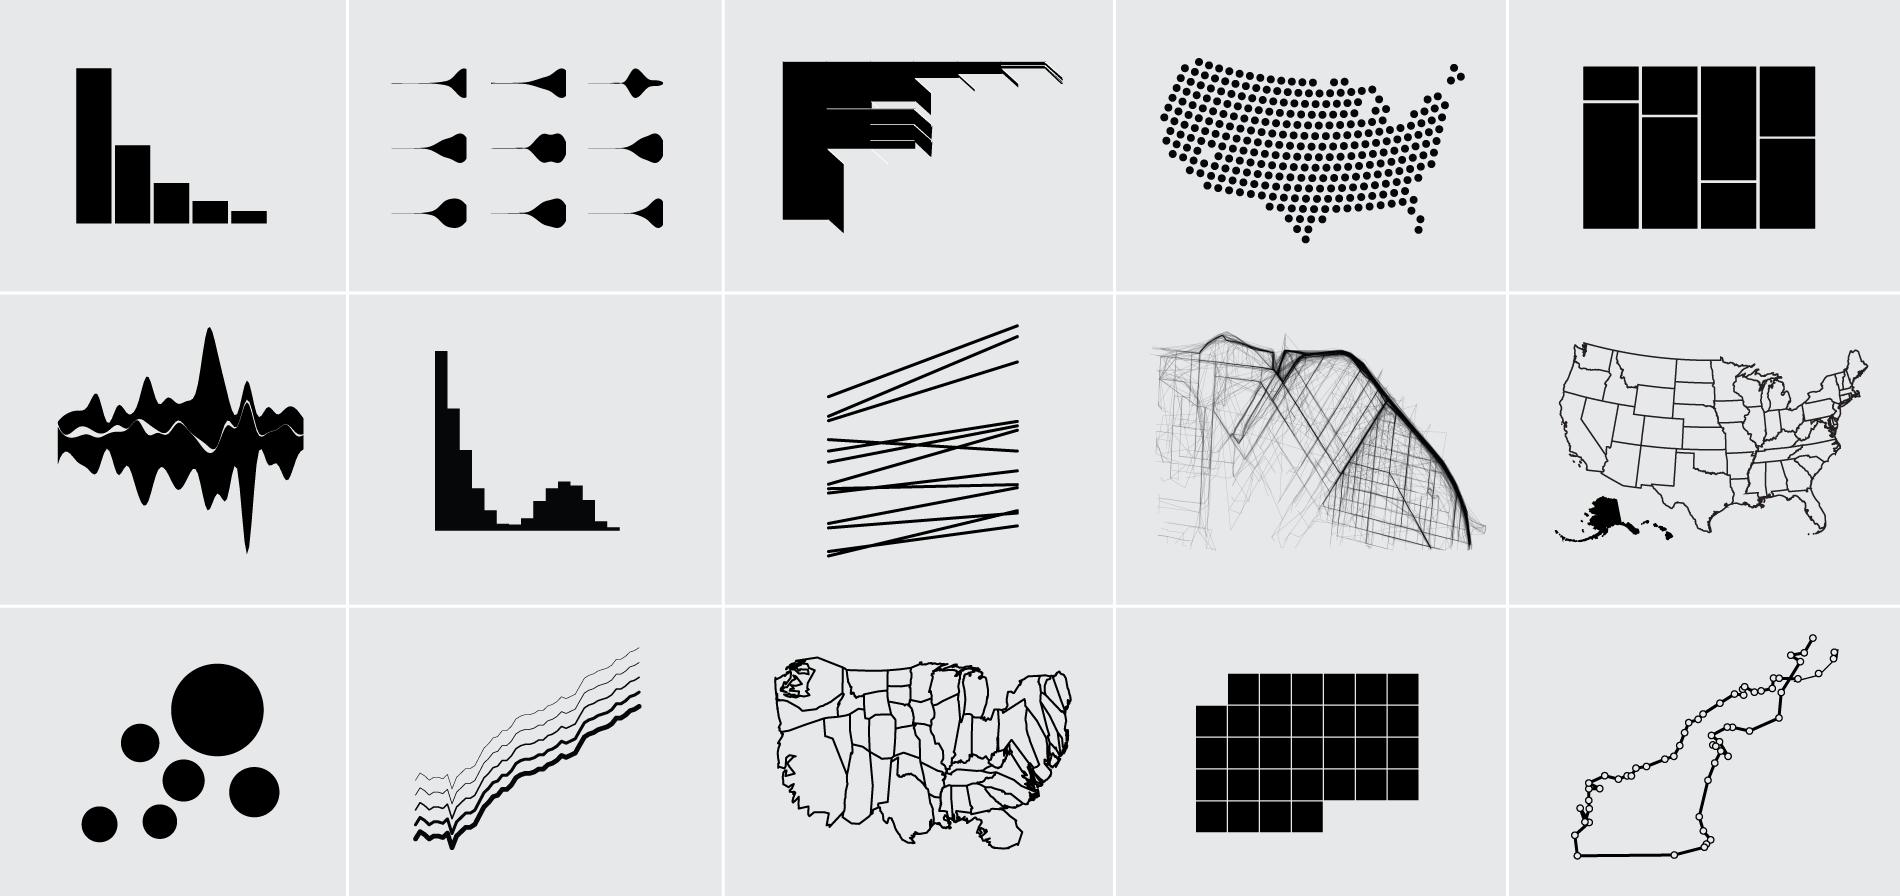 Visualization-Tutorials-on-FlowingData